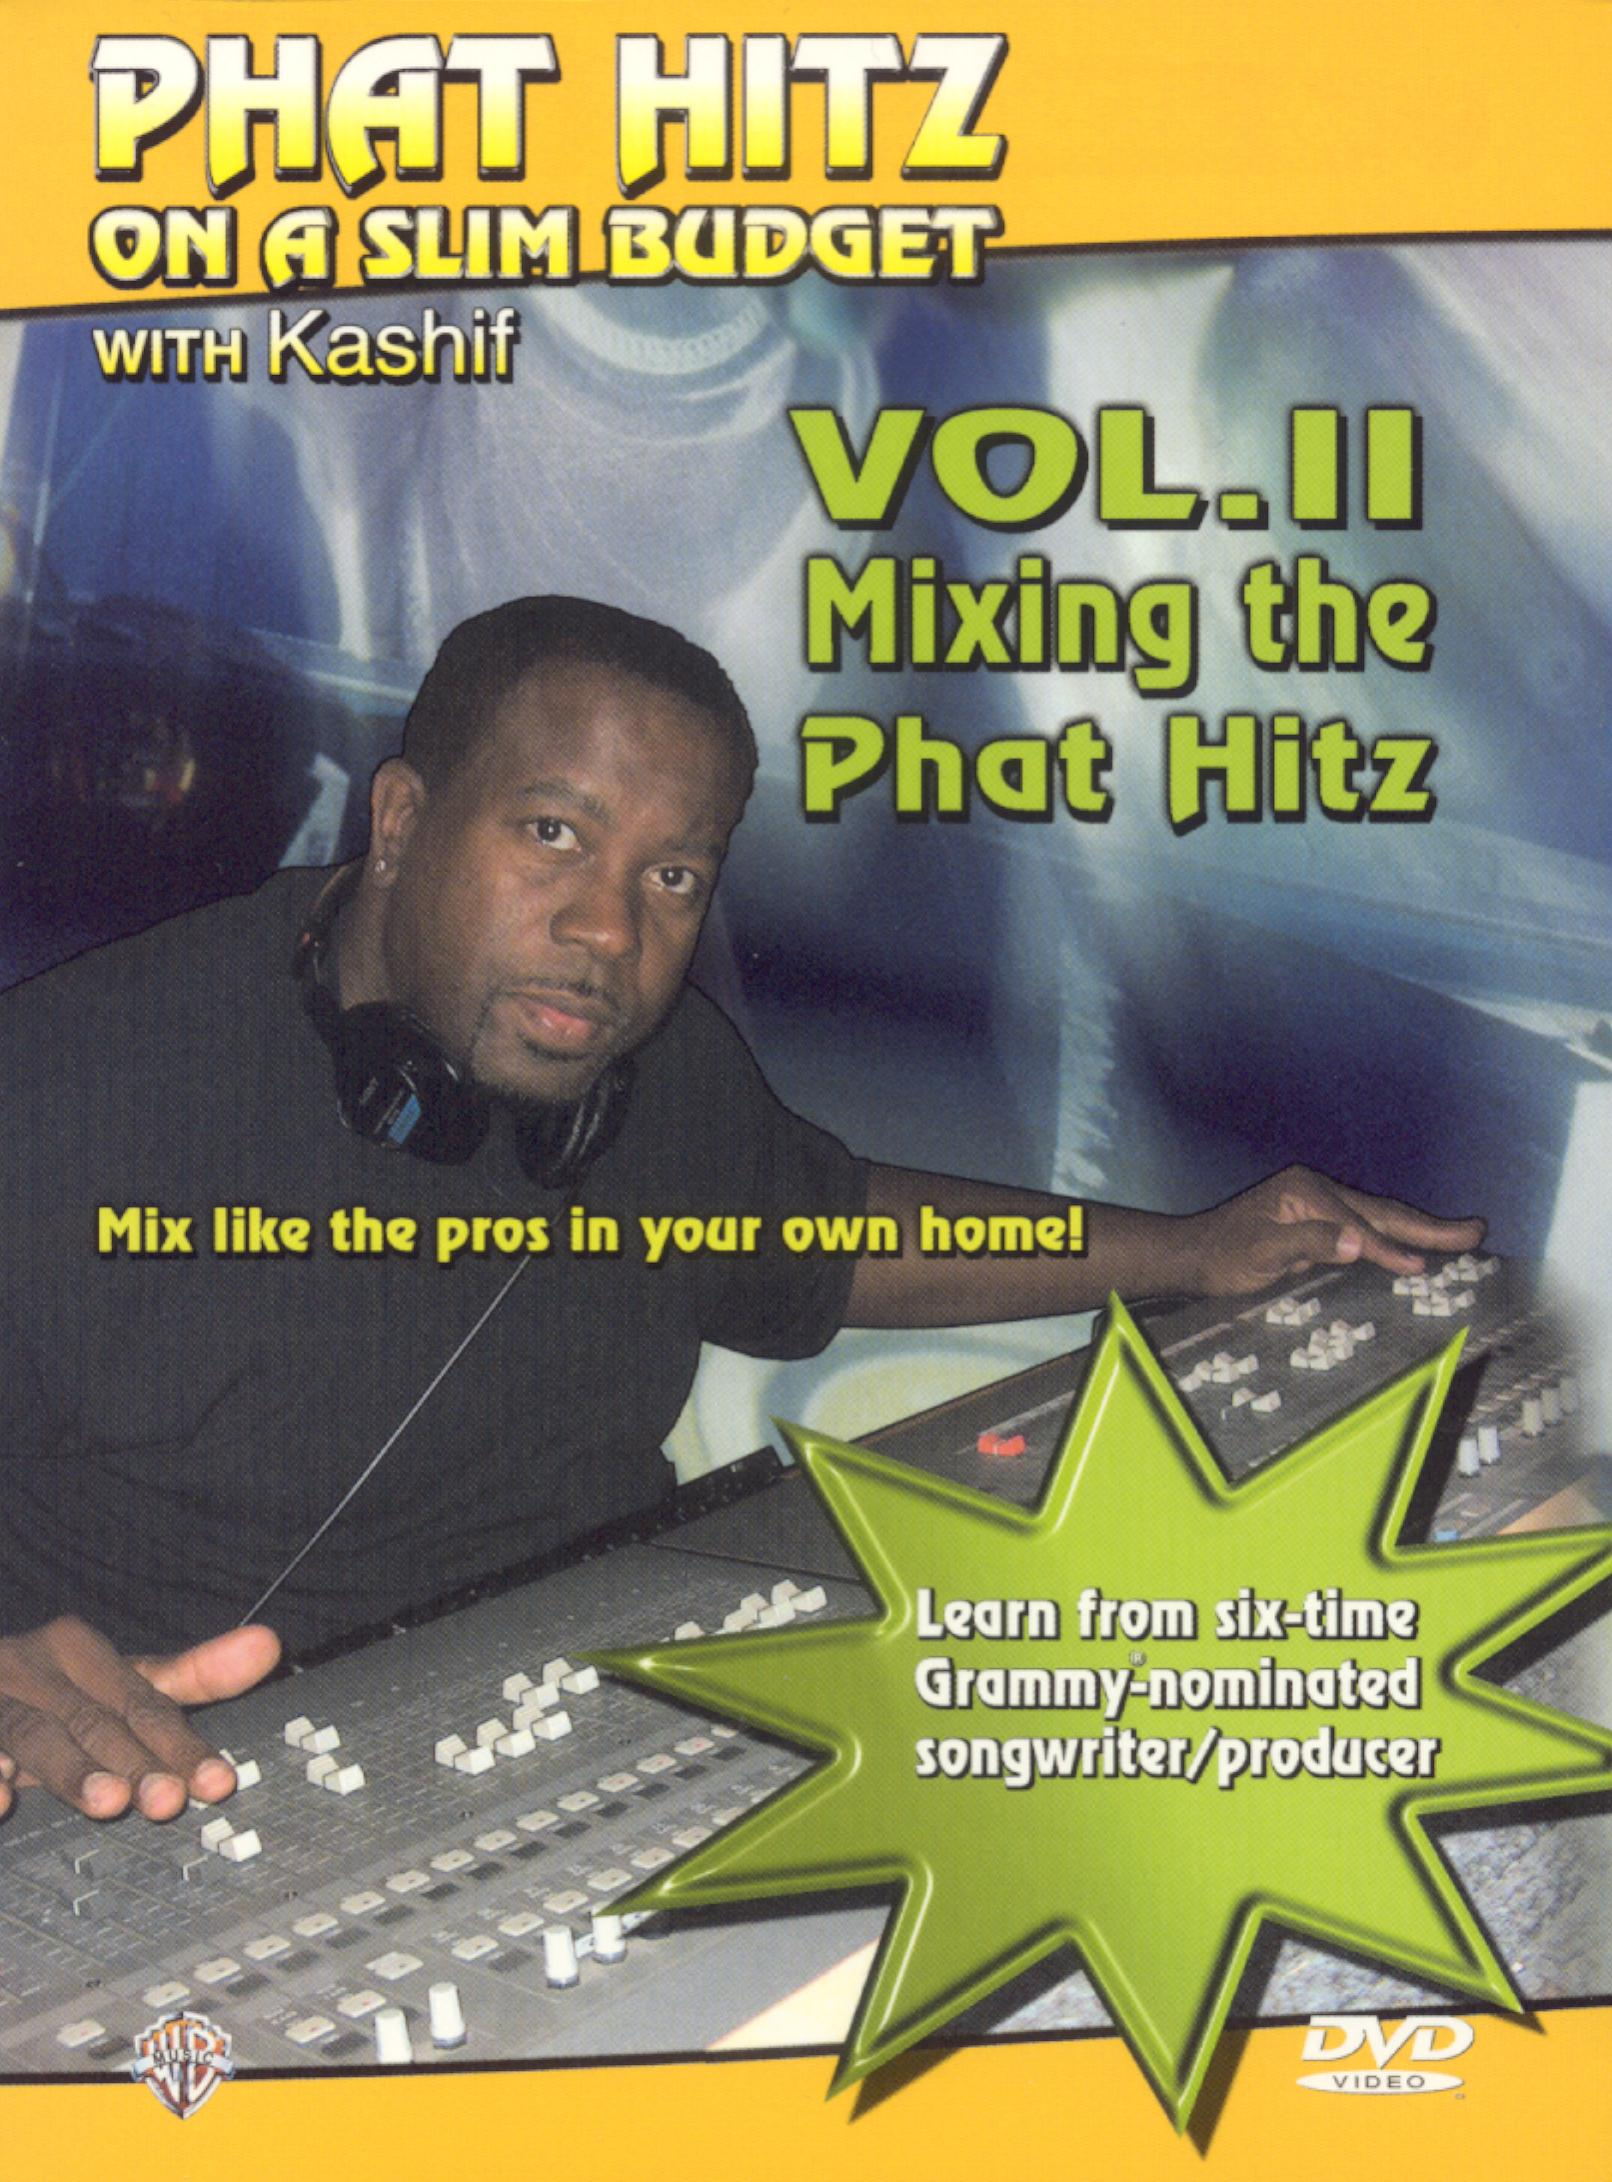 Mixing the Phat Hitz, Vol. 2